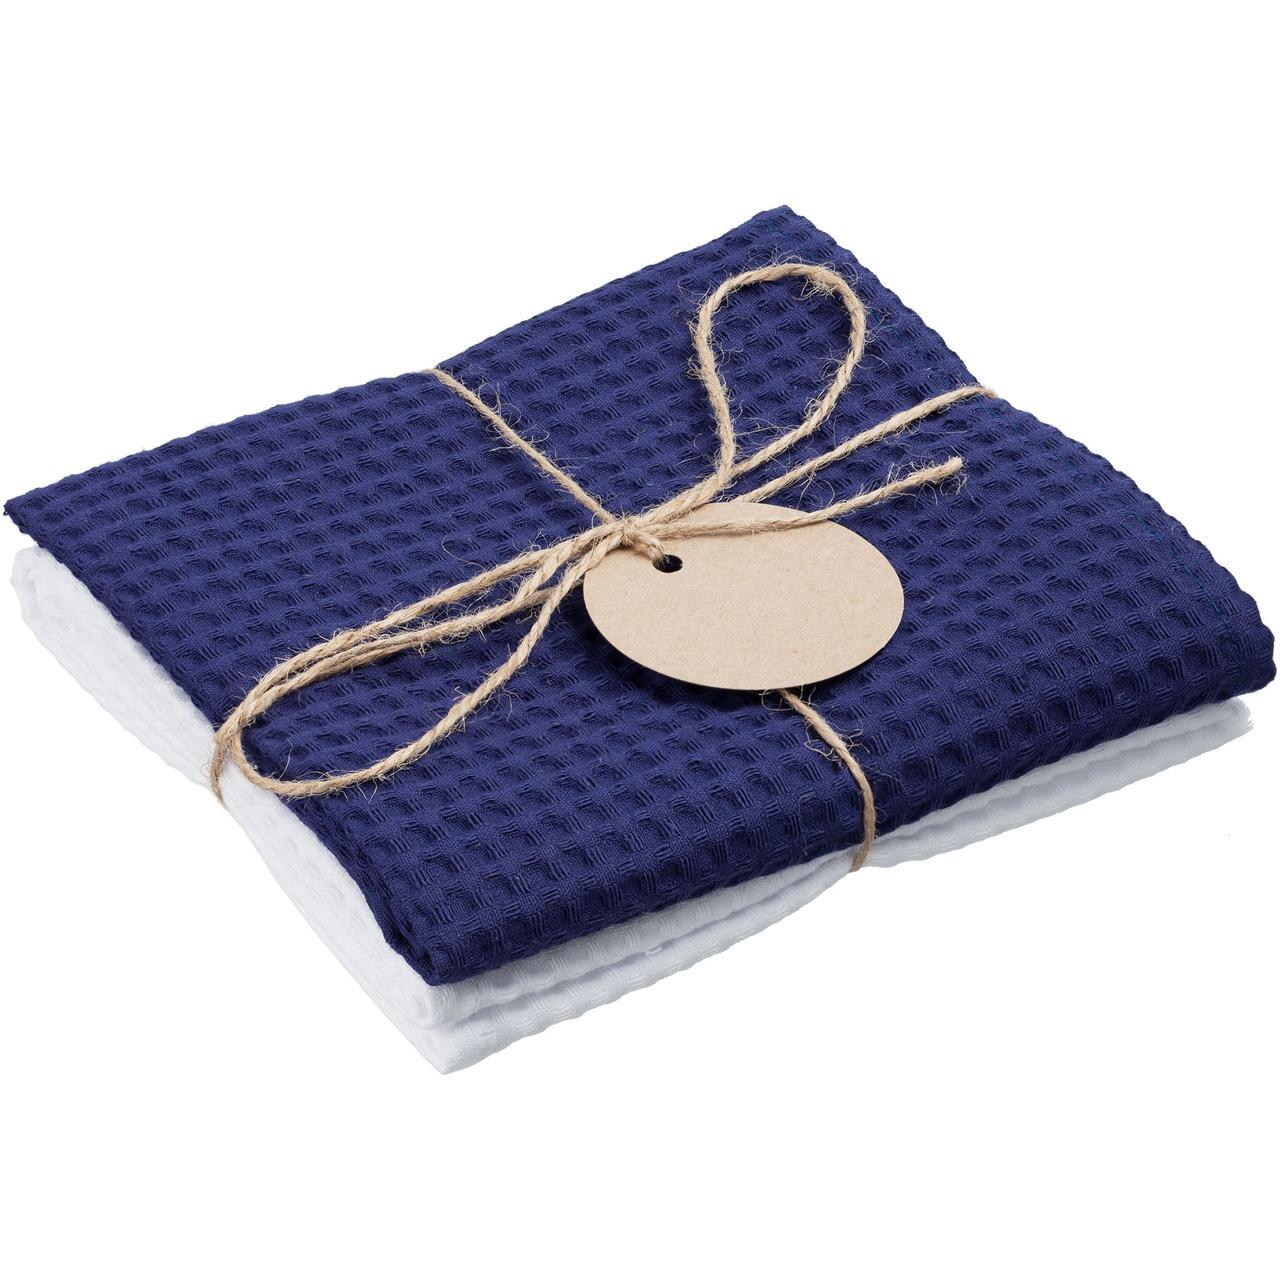 Набор кухонных полотенец Good Wipe, белый с синим (артикул 11176.64)